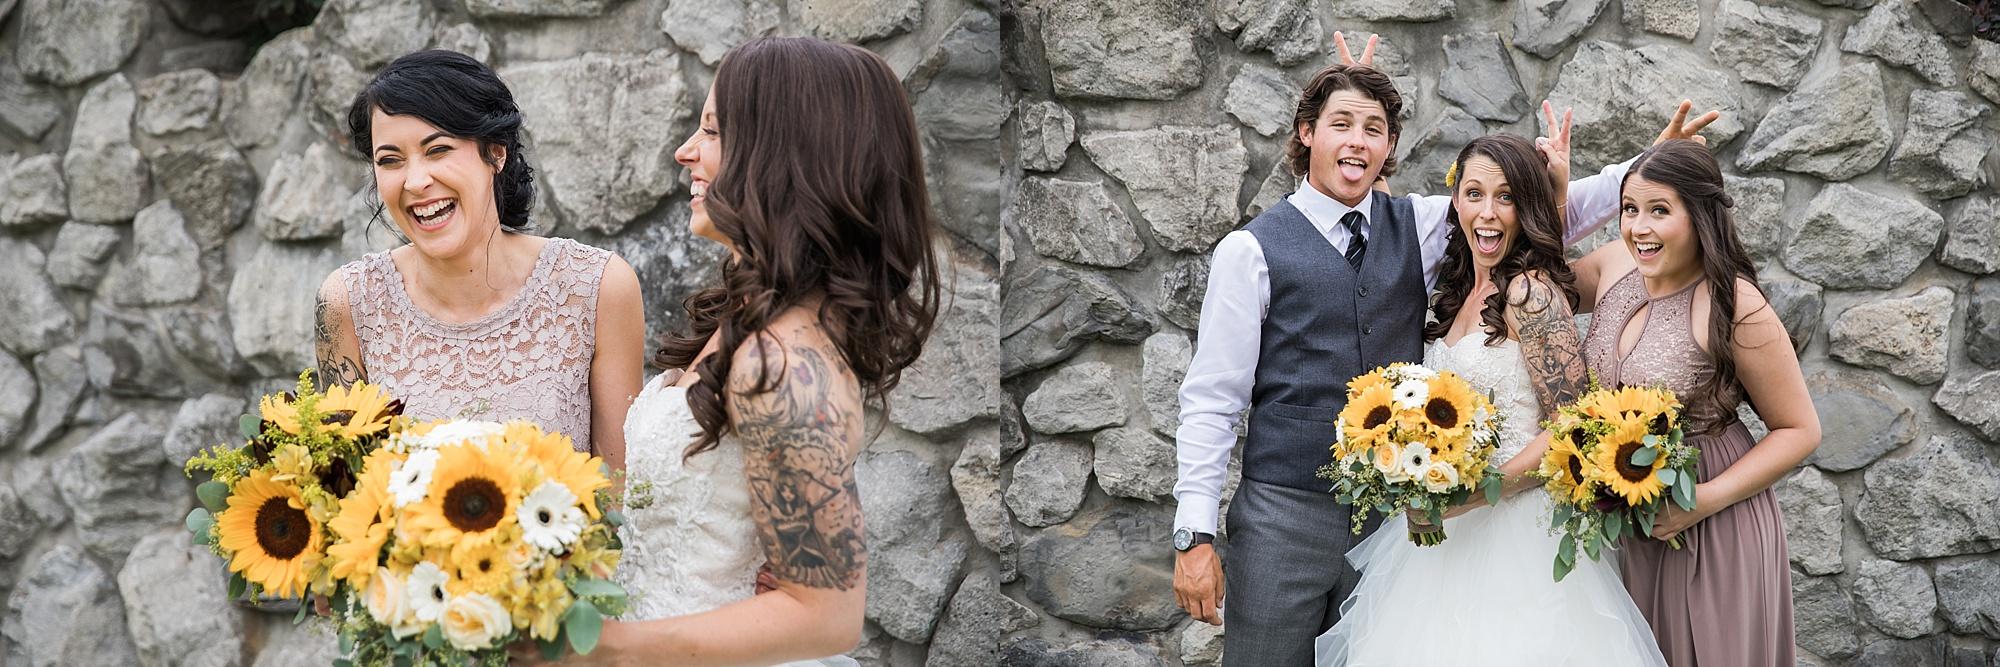 lipapark-hernderwinery-wedding_0041.jpg